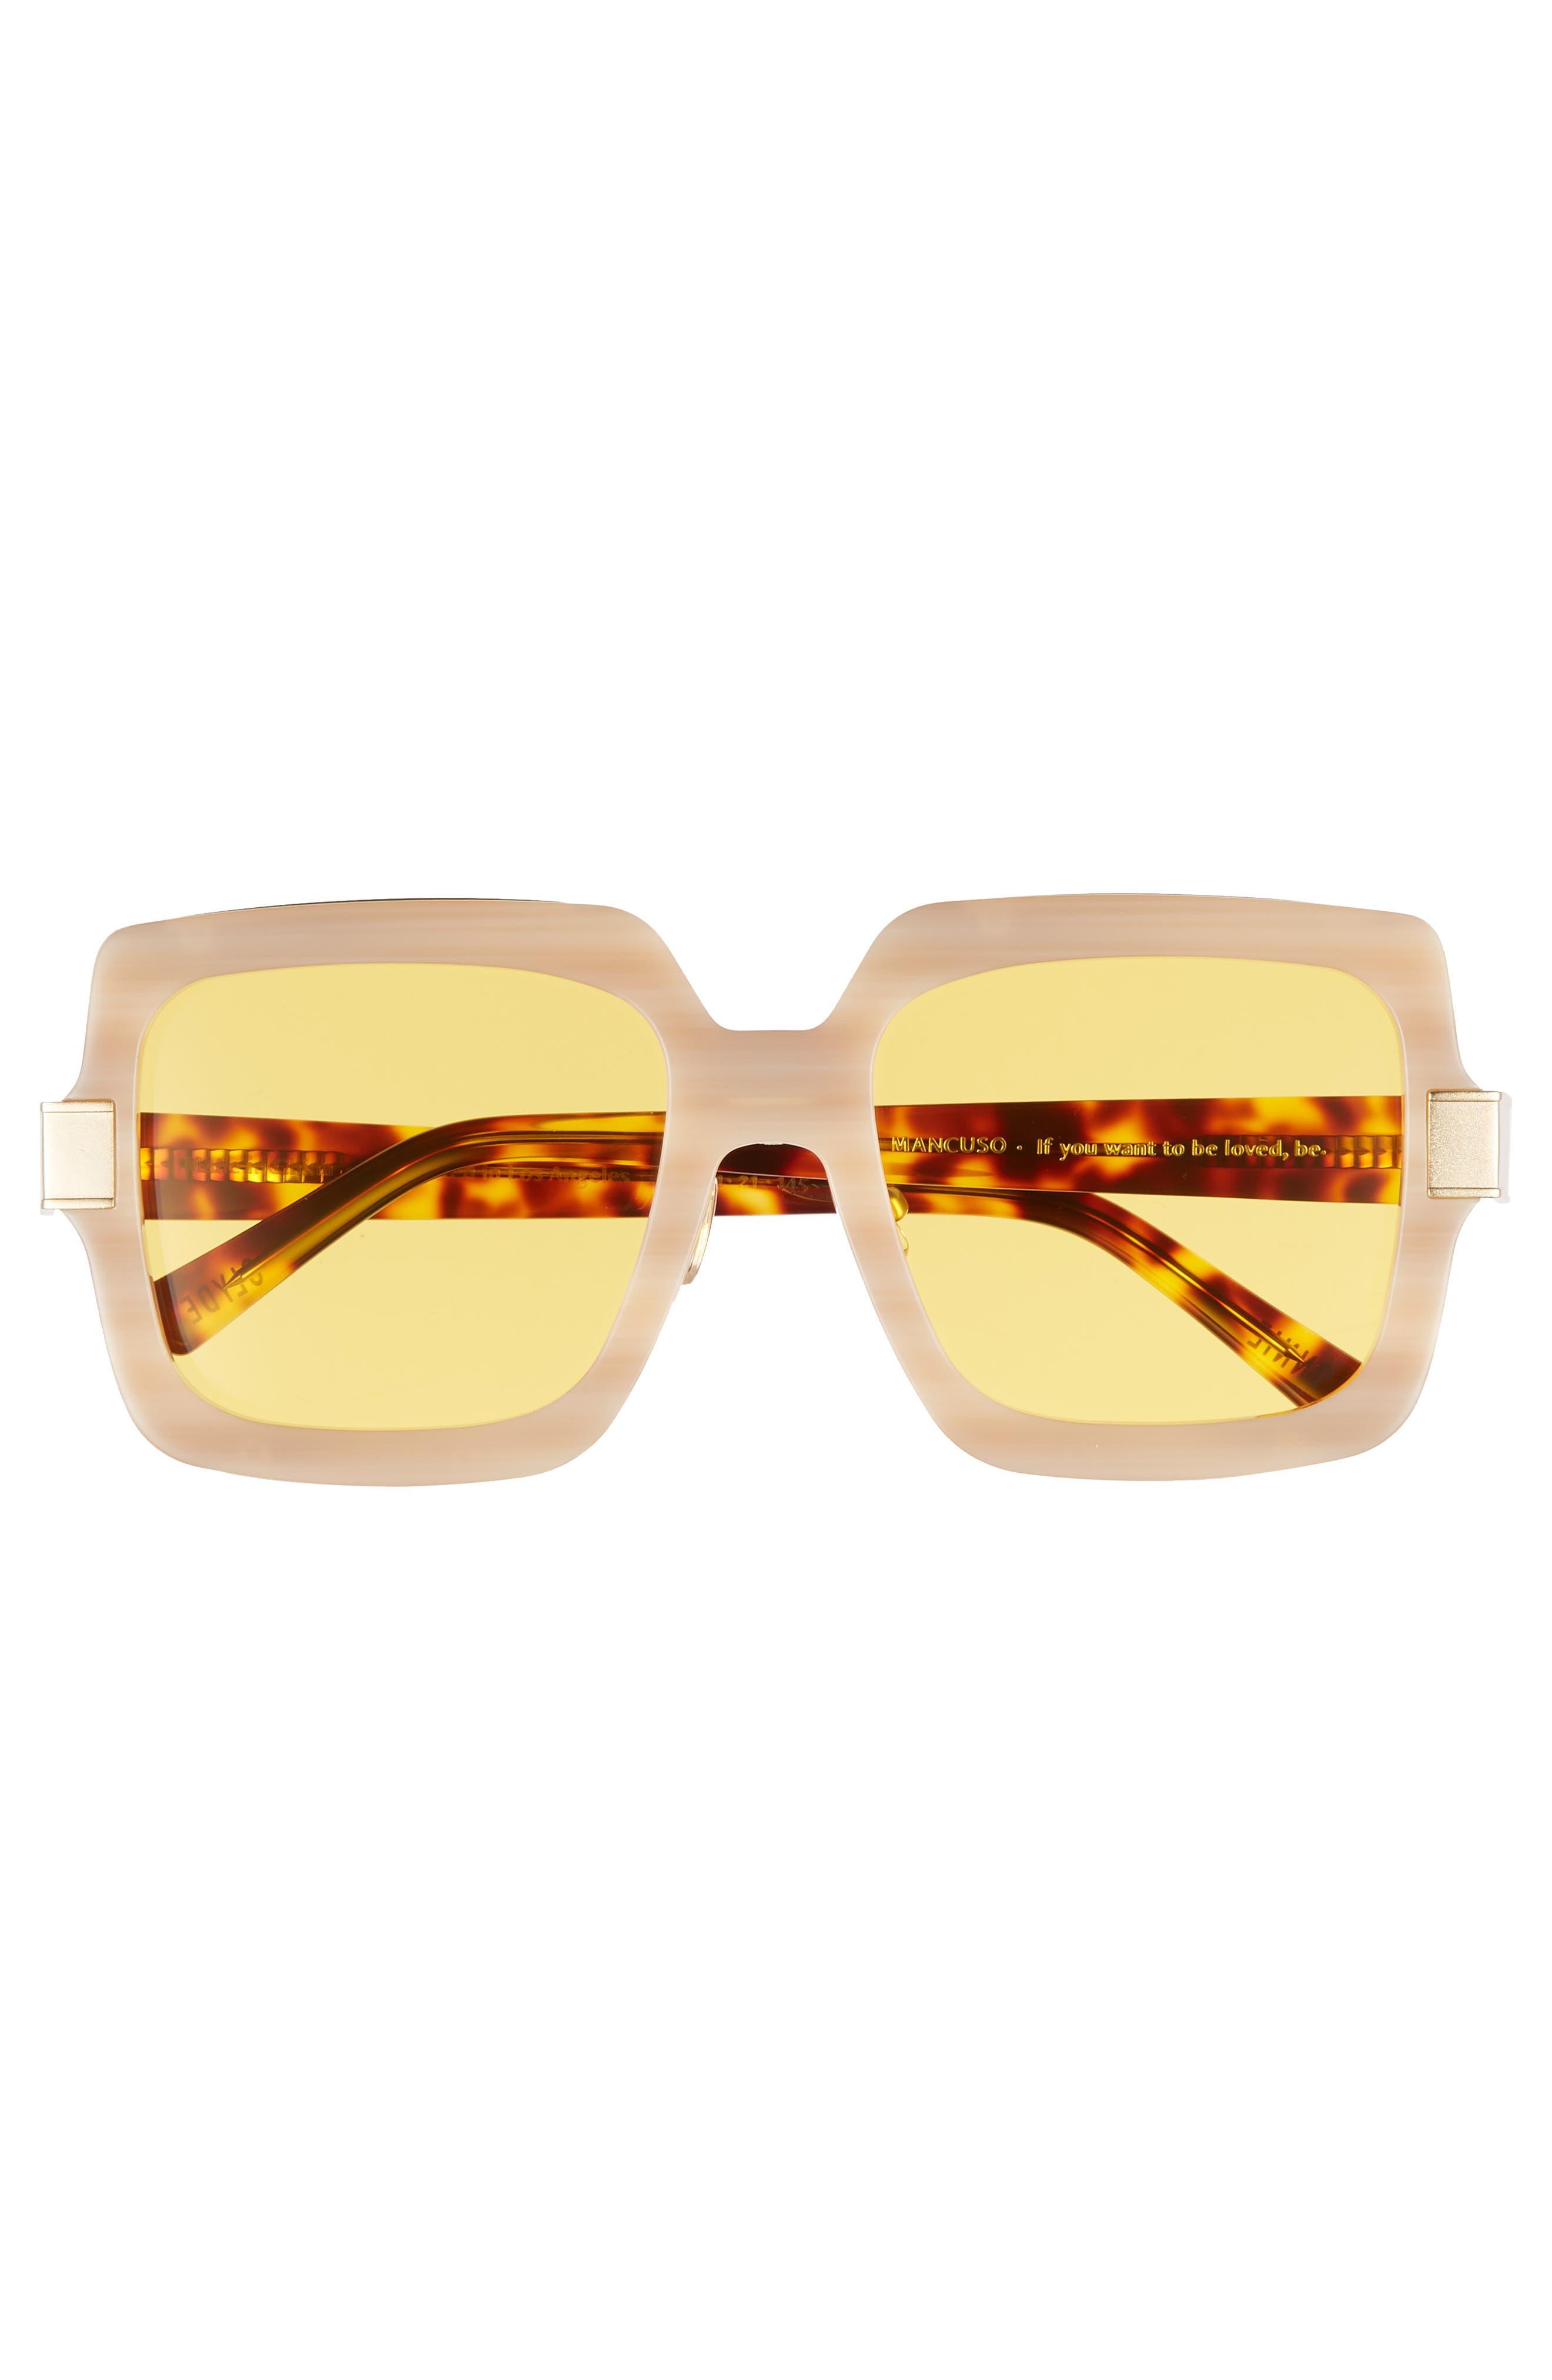 Mancuso 54mm Sunglasses,                             Alternate thumbnail 3, color,                             Red Elm/ Yellow